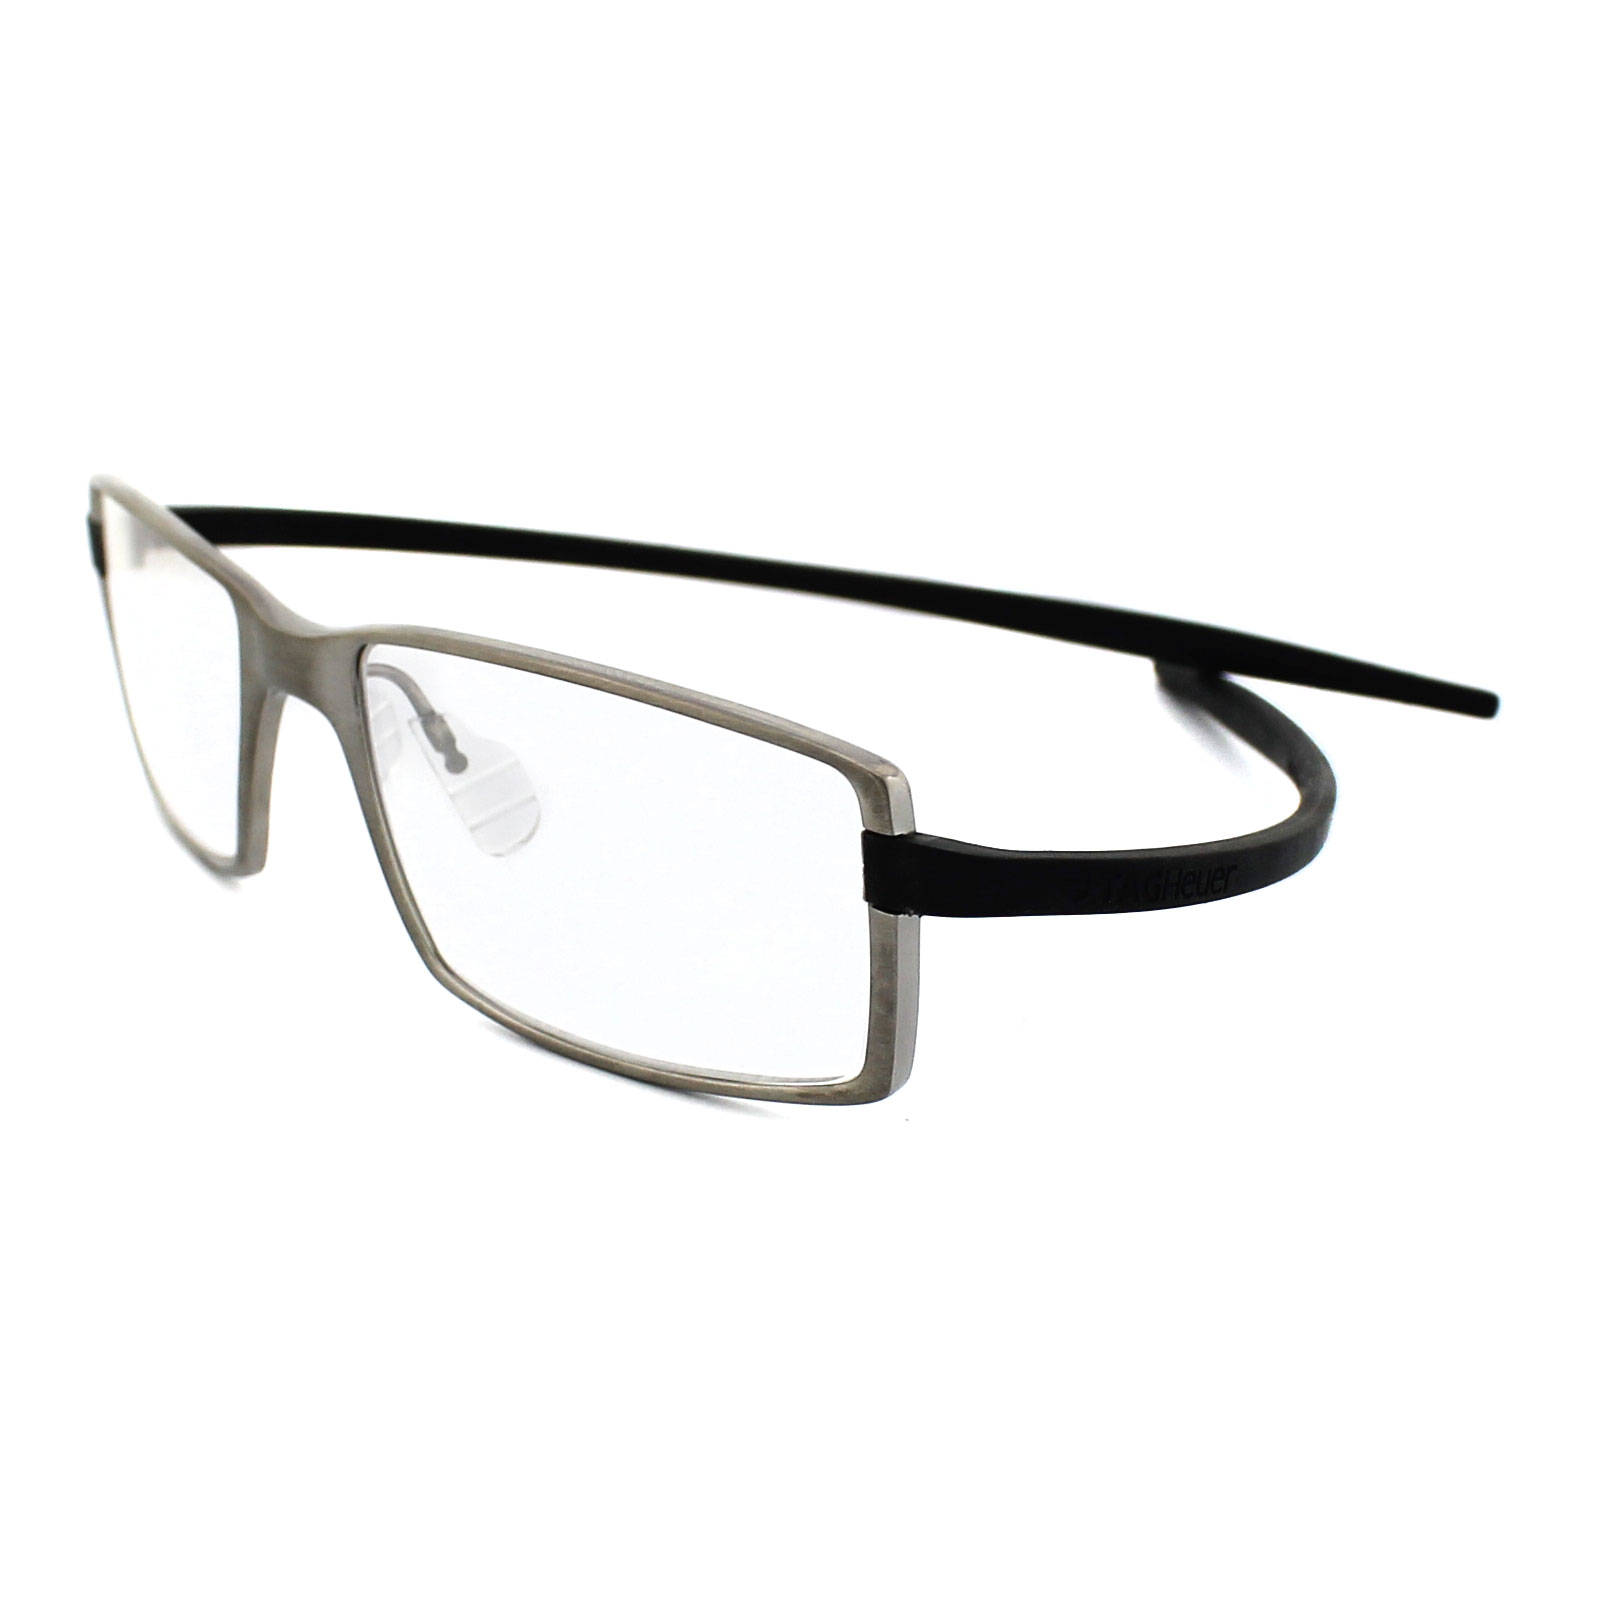 Tag Heuer Reflex Glasses Review - Best Glasses Cnapracticetesting ...